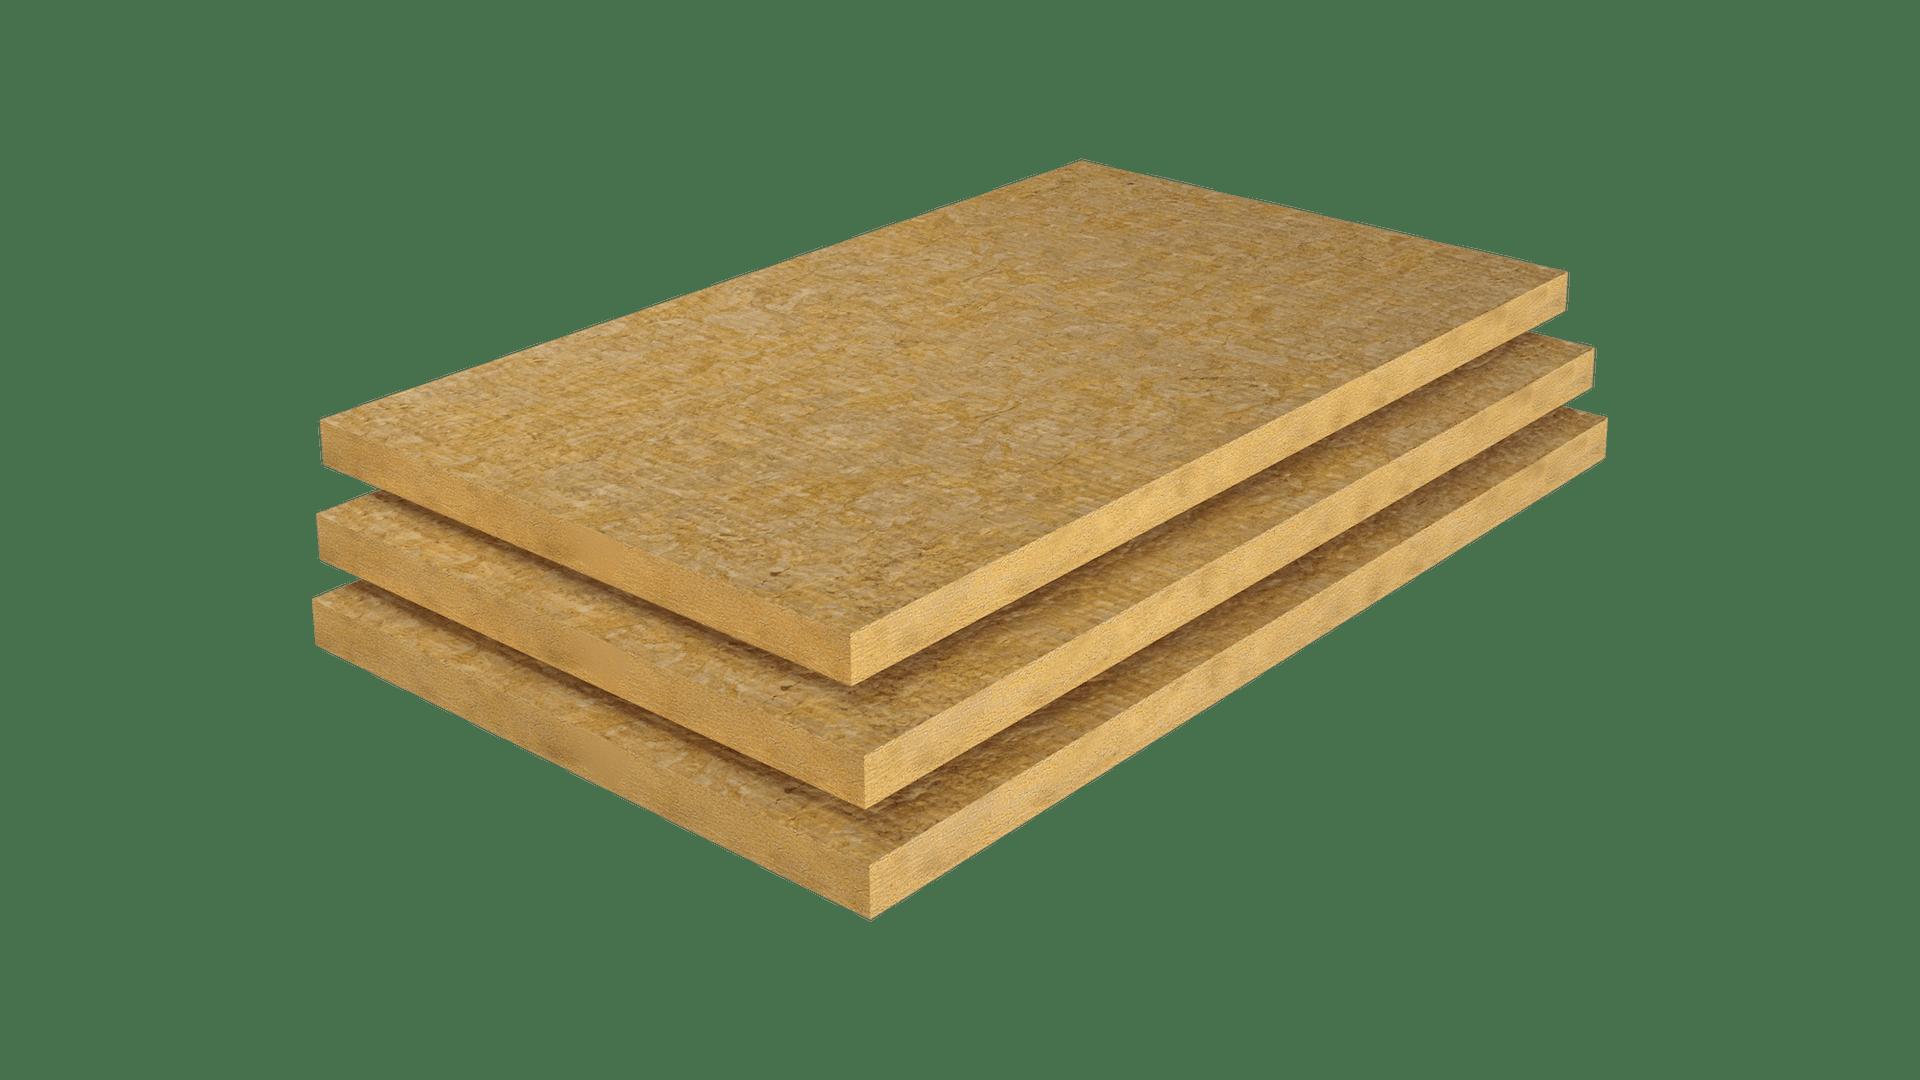 RUF BATTS V EXTRA, RUF BATTS, roof, roof insulation